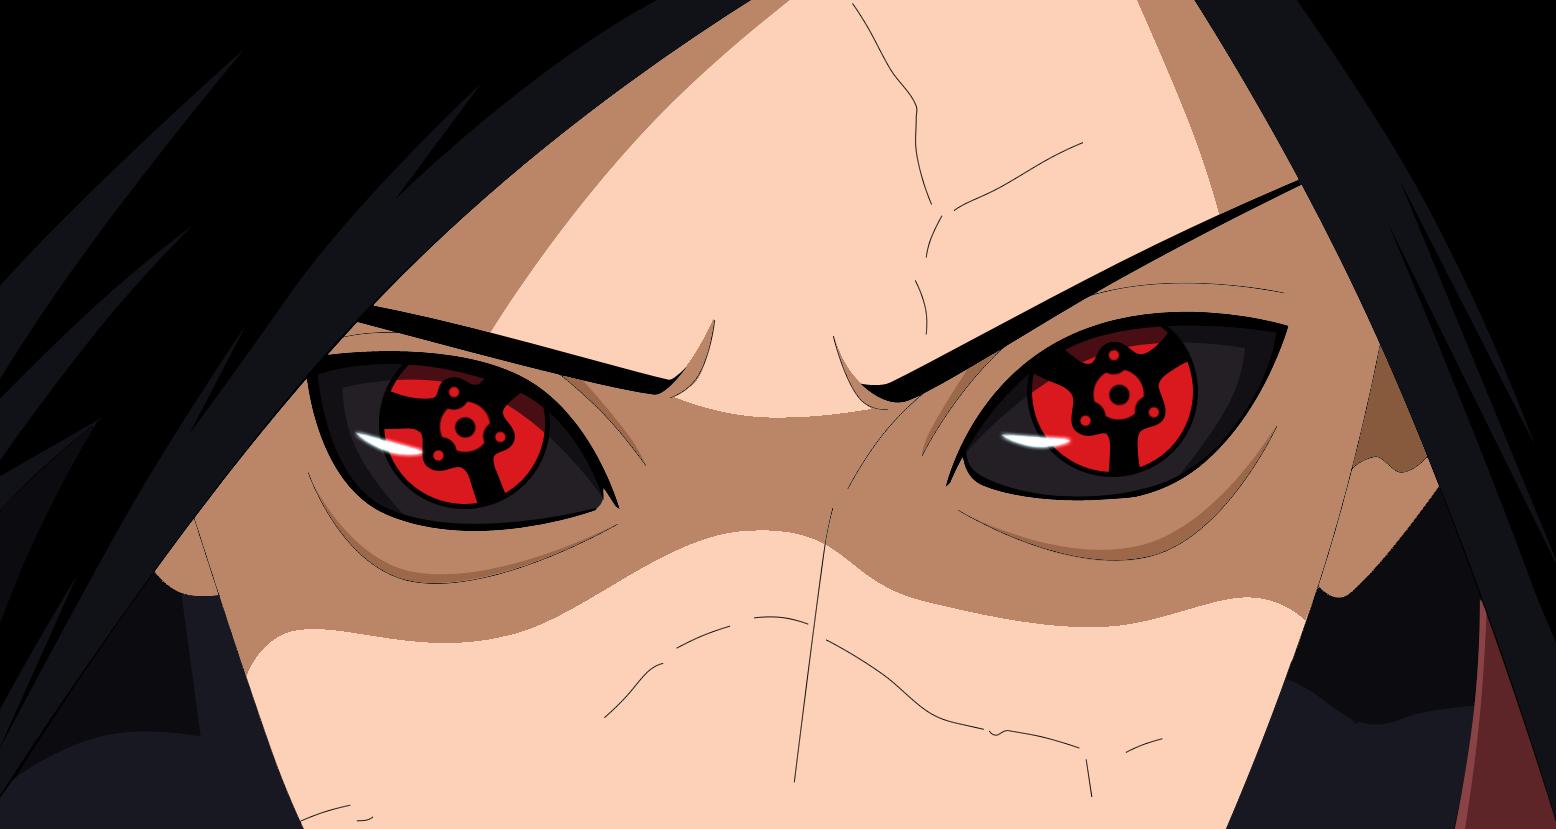 Jenis Mangekyou Sharingan Di Naruto | Top Lintas